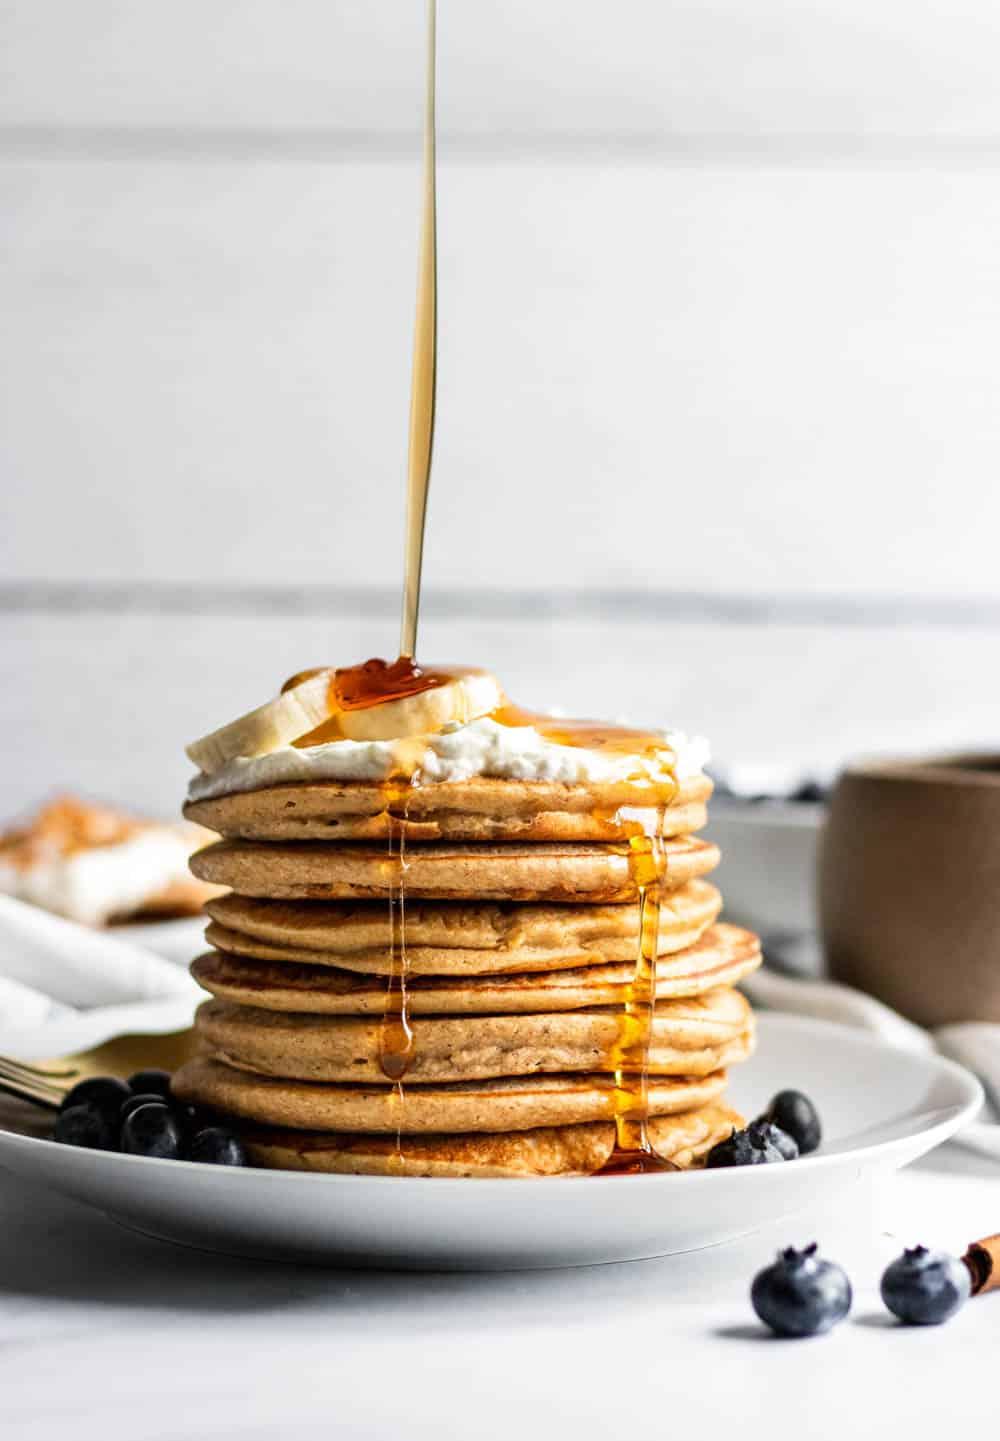 Maple pour shot over stack of banana blender pancakes.